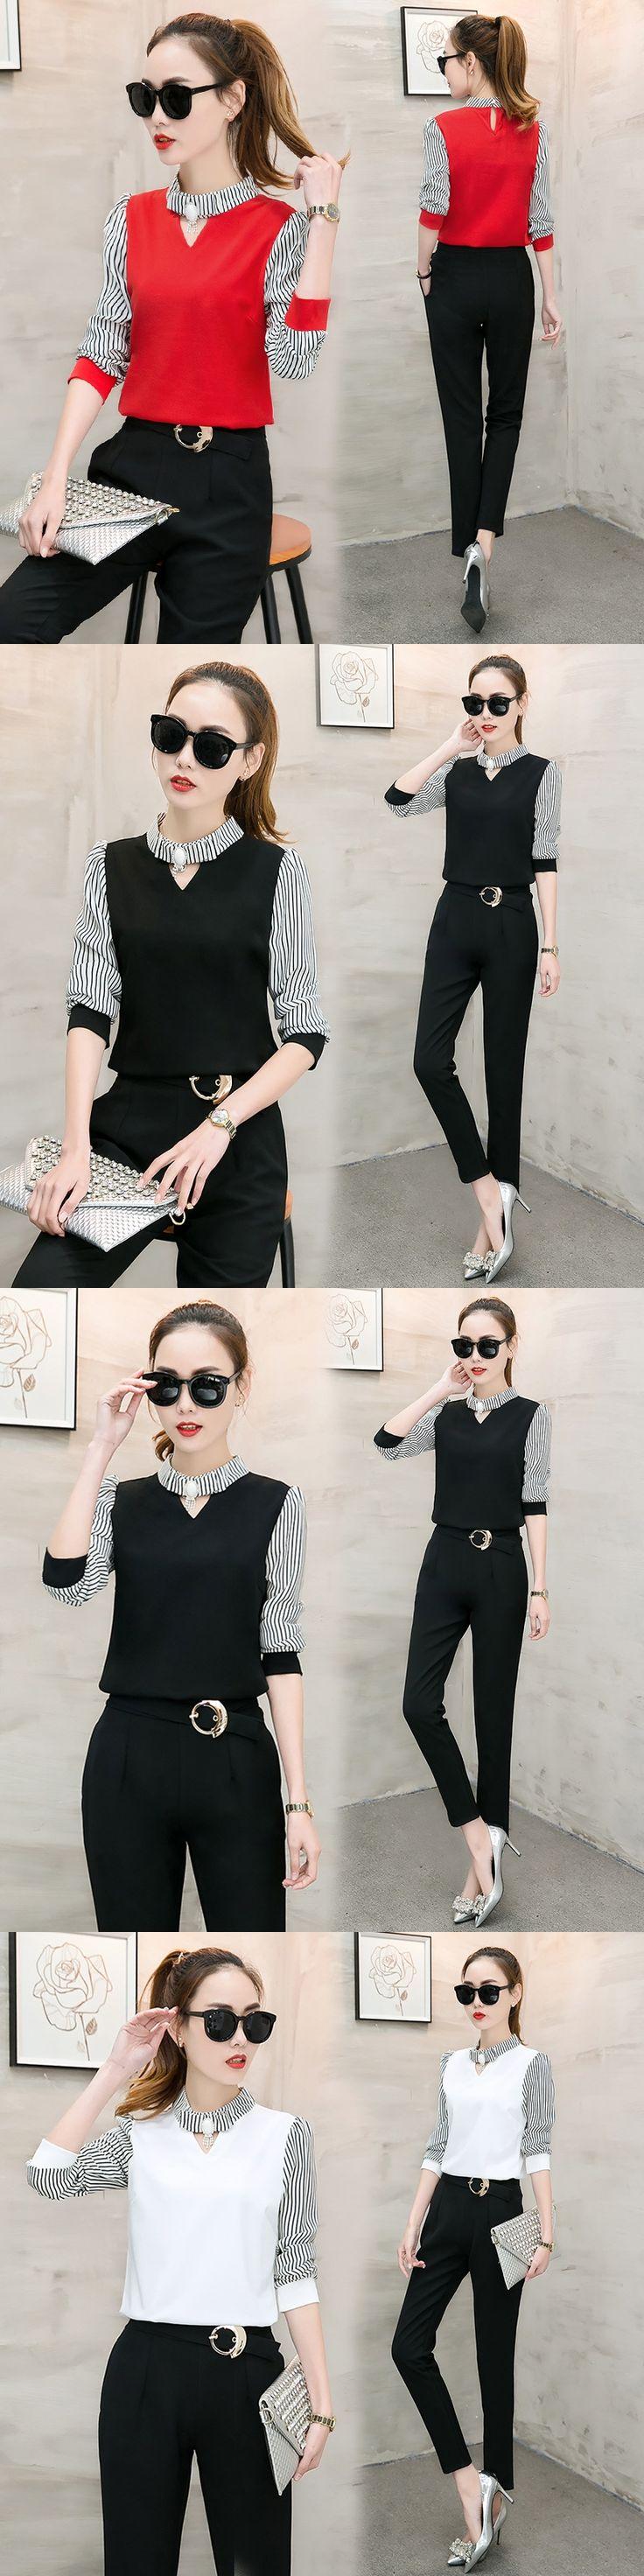 Autumn wear new casual pants suit korean fashion two-piece clothing set chiffon blouse stripe black pants office lady outfit